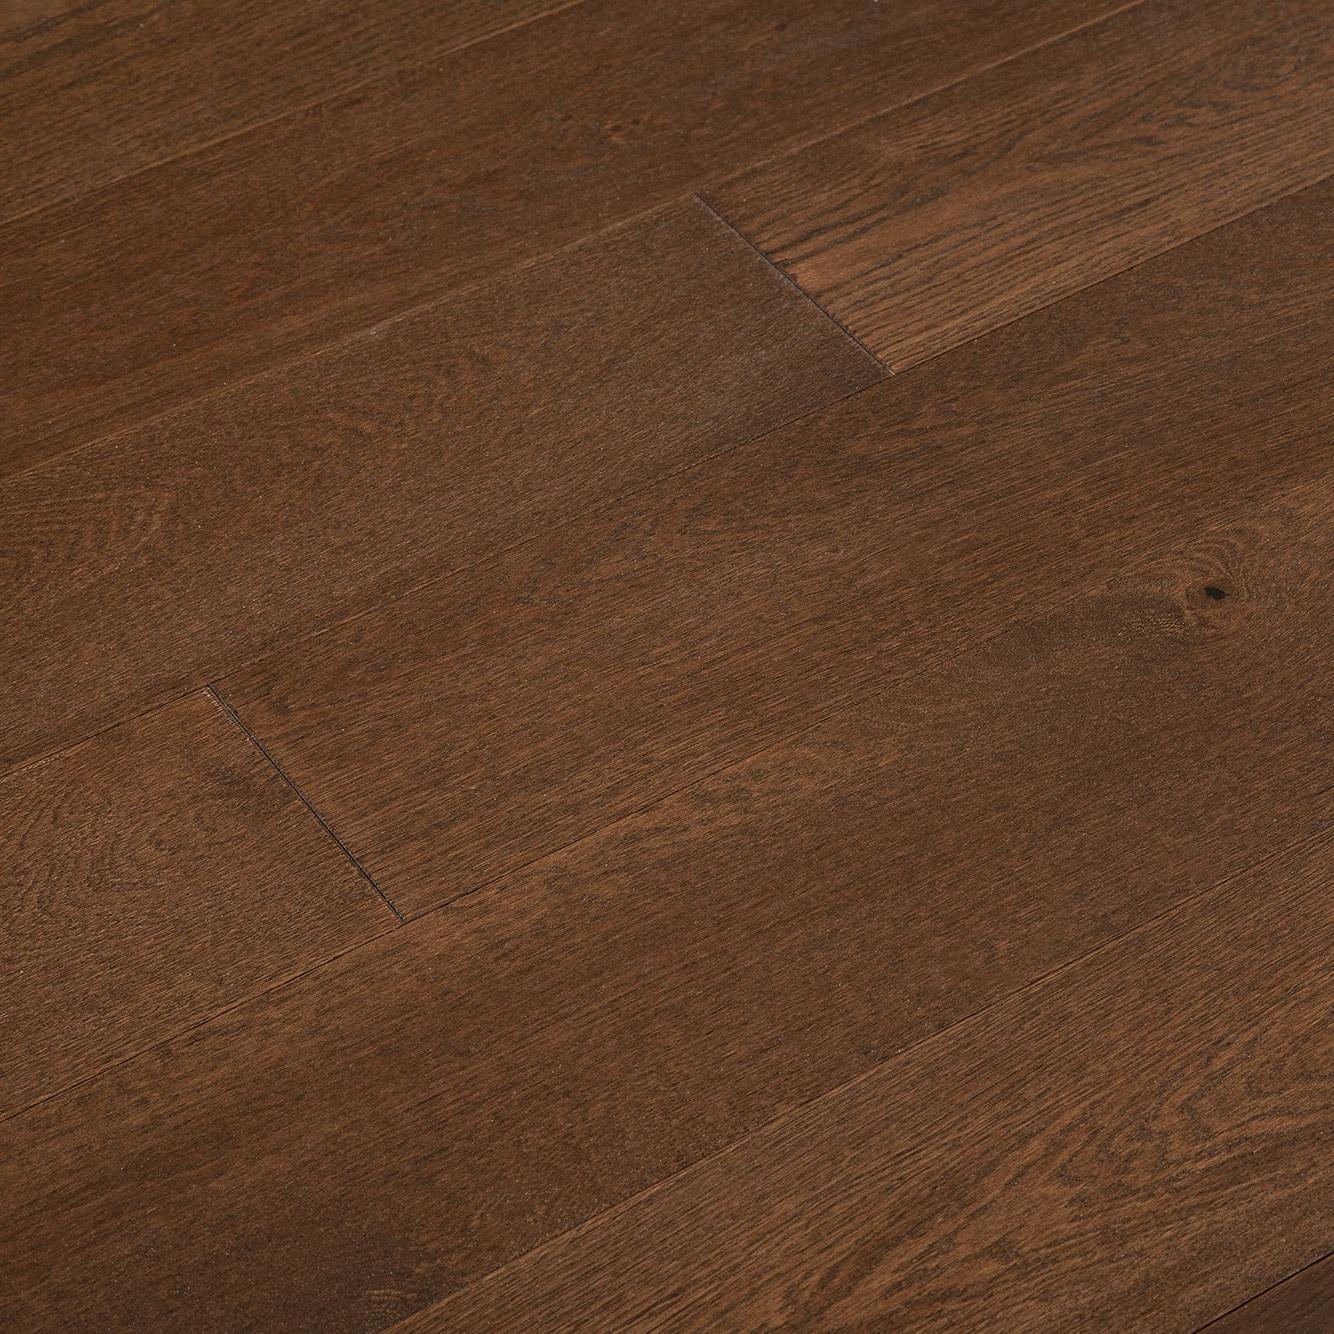 "Willard / Oak / Wirebrushed / Builders Grade / 6 1/2"" Engineered Hardwood - LongHorn Collection 0"